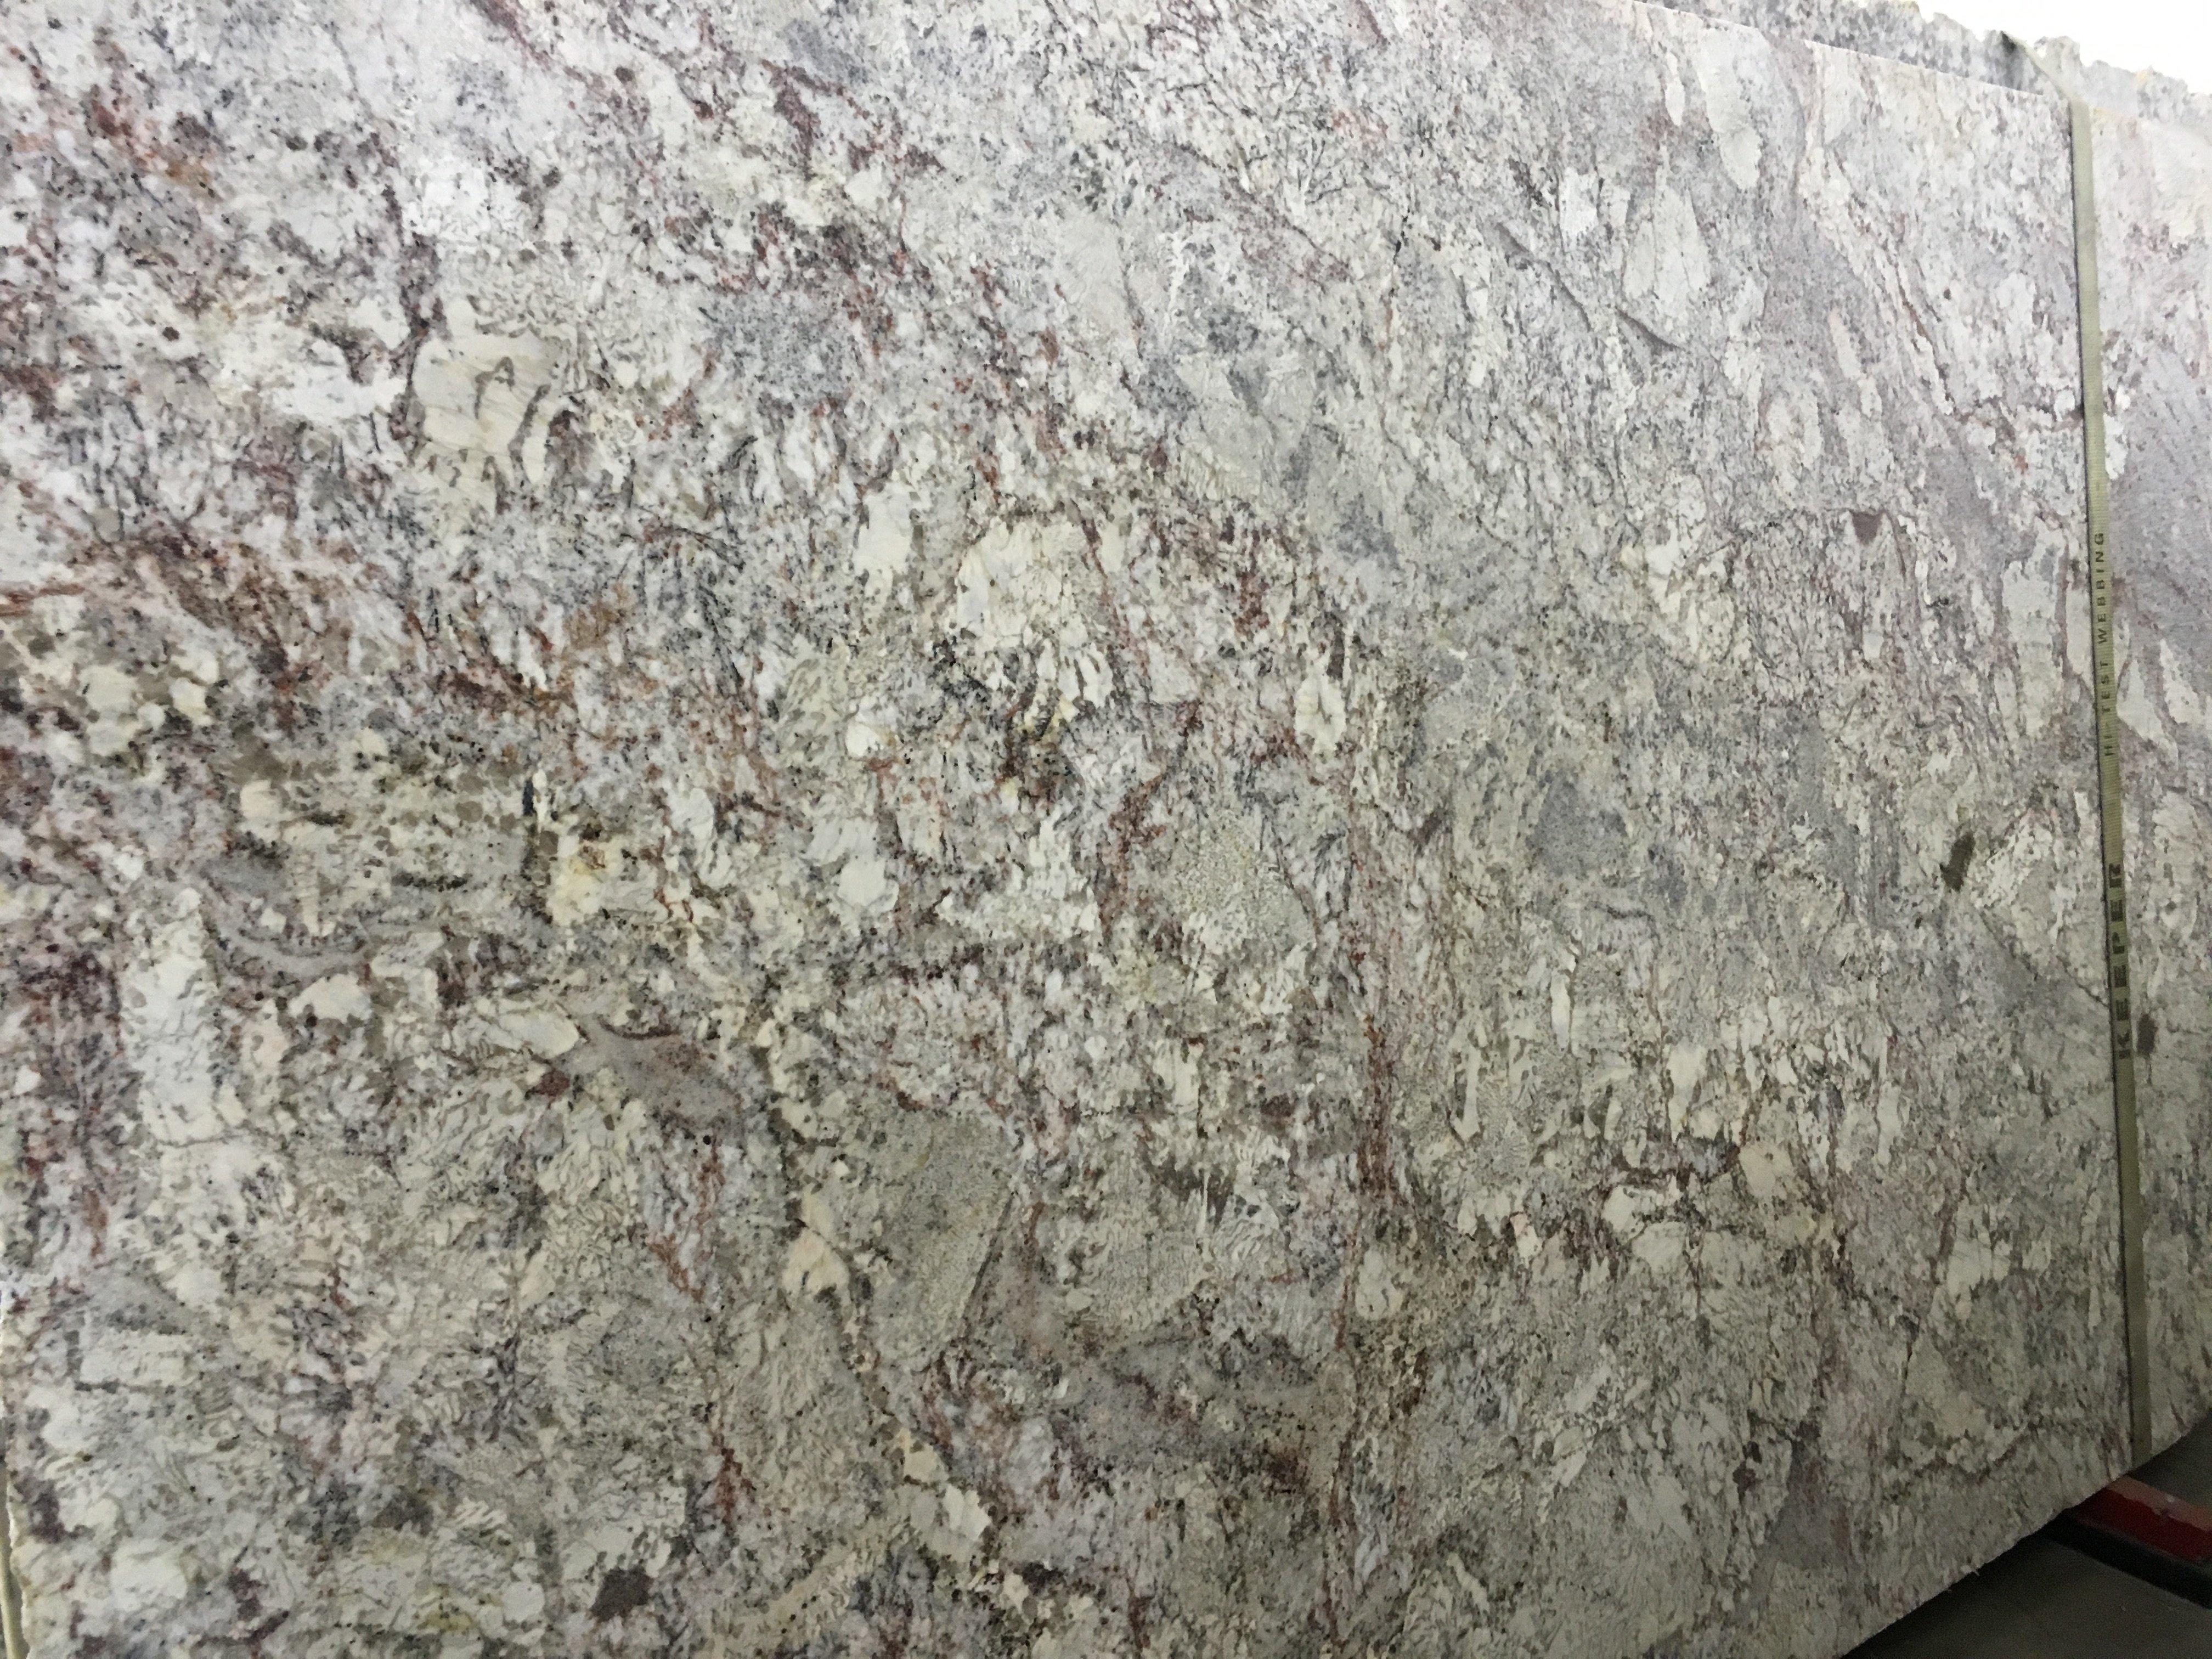 White Springs Leather Granite Slab Trendy Surfaces